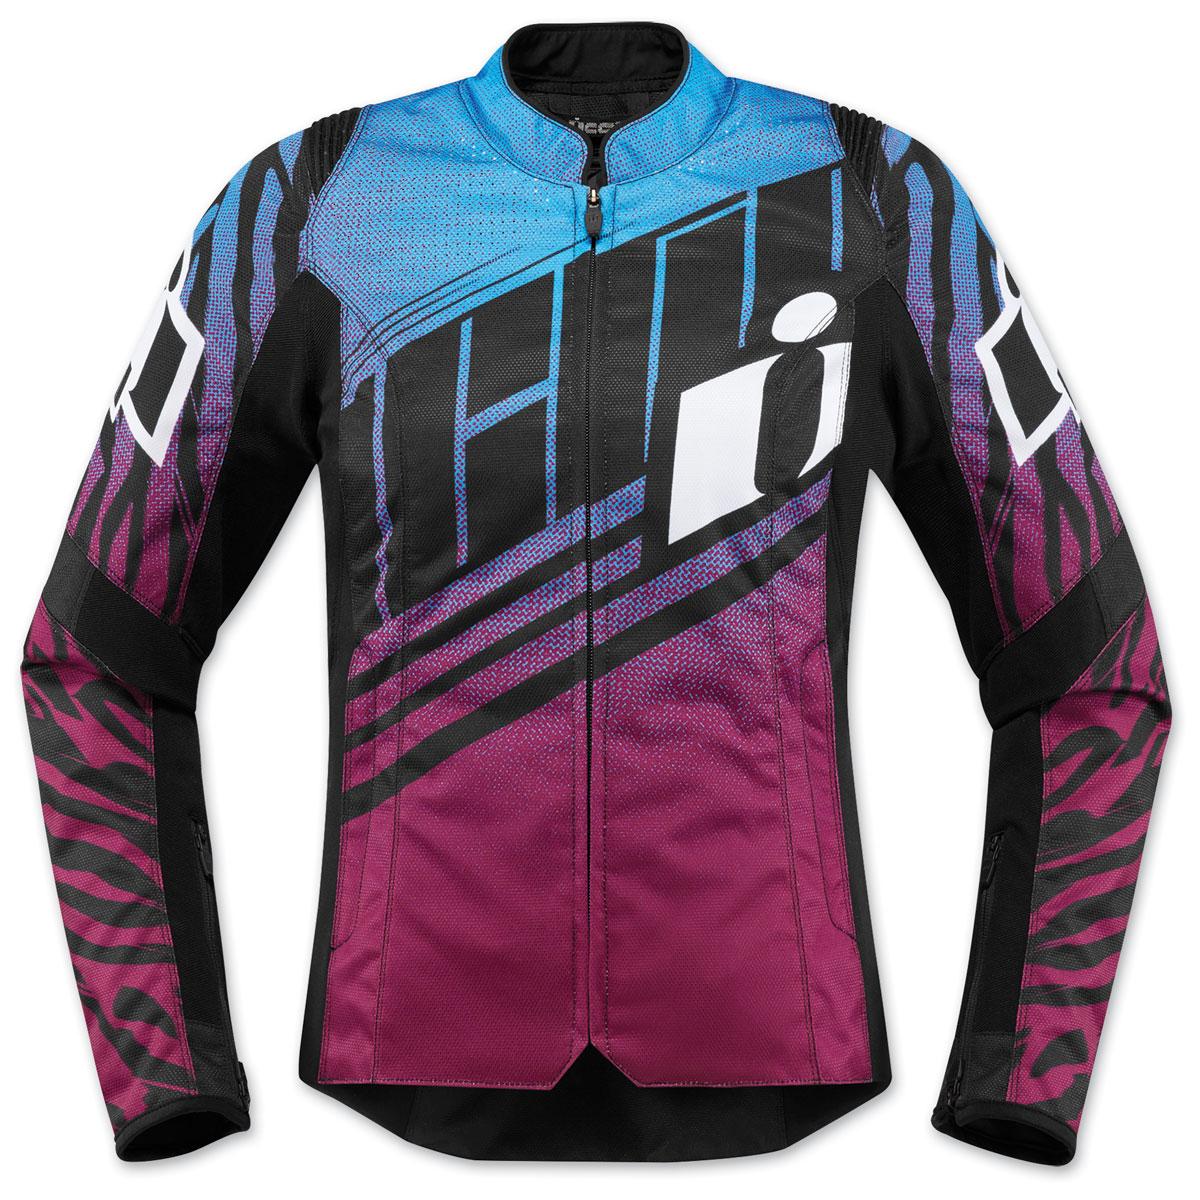 ICON Women's Overlord SB2 Wild Child Purple Textile Jacket